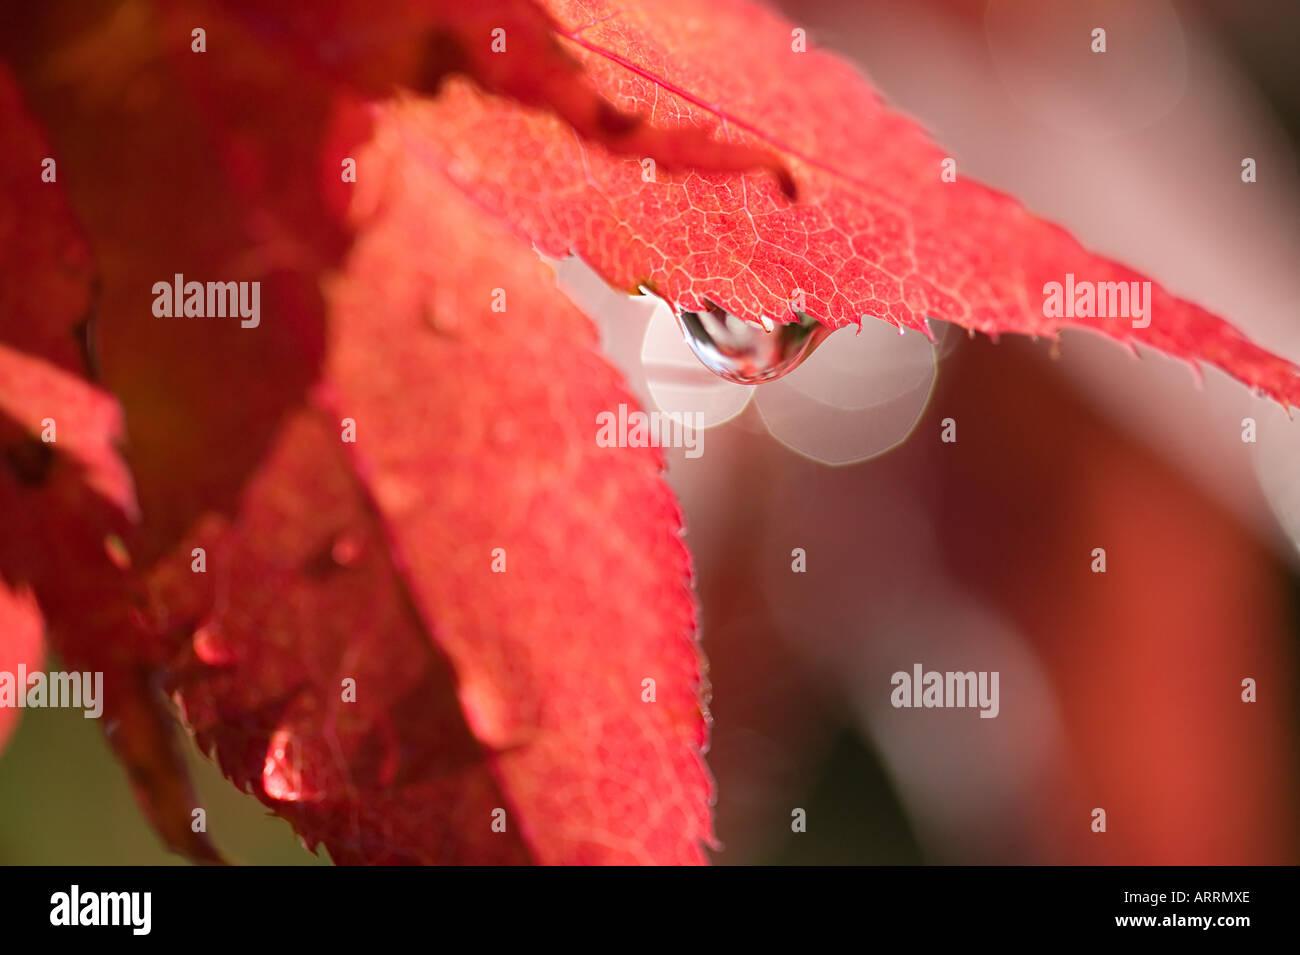 Gotas de agua sobre una hoja de arce Imagen De Stock